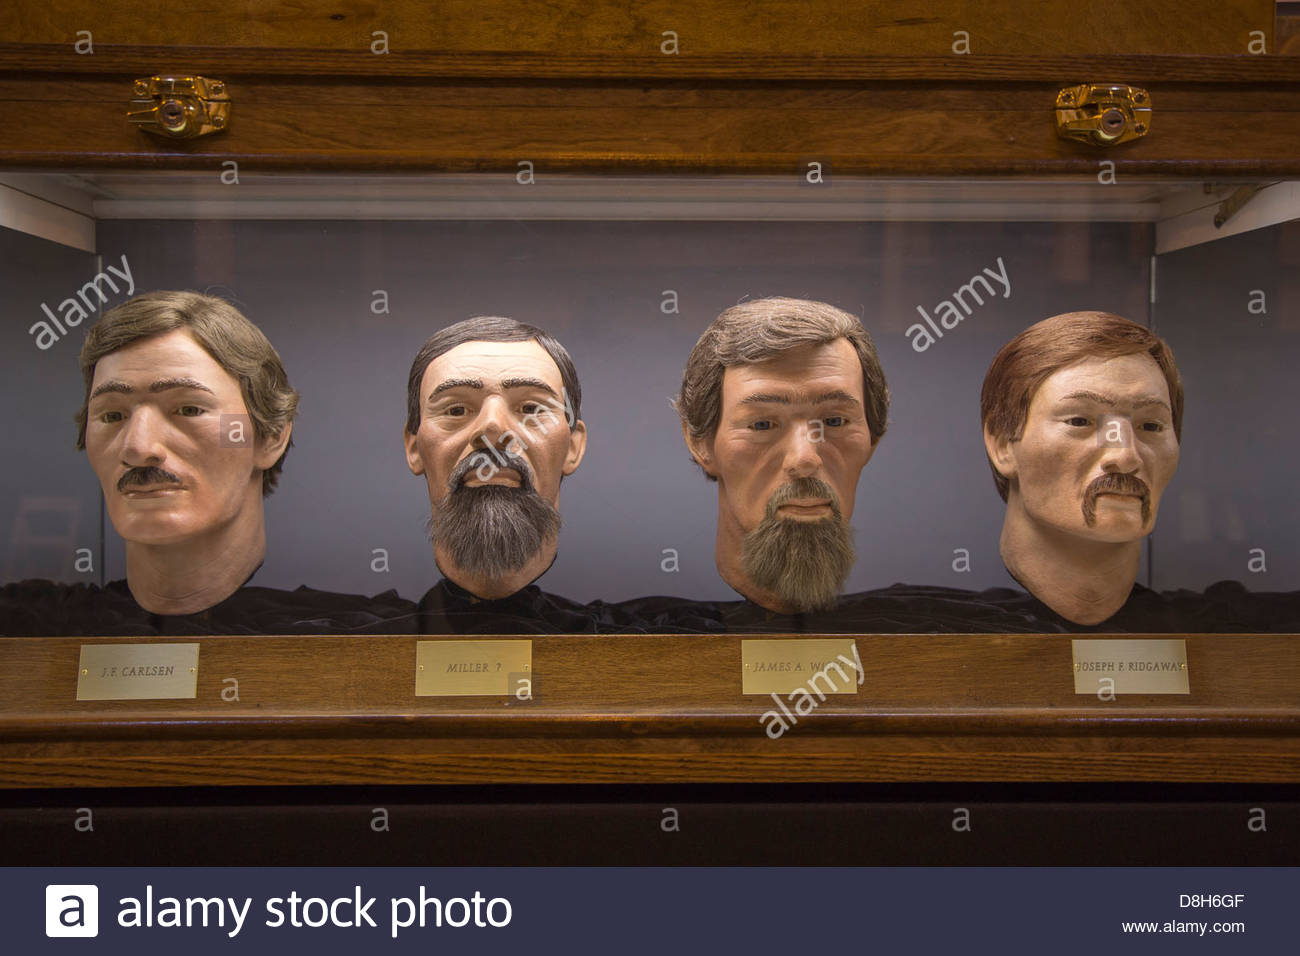 Crew, Gesichts-Rekonstruktion, Hunley Museum, Charleston Schiffswerften, Charleston, South Carolina Stockbild